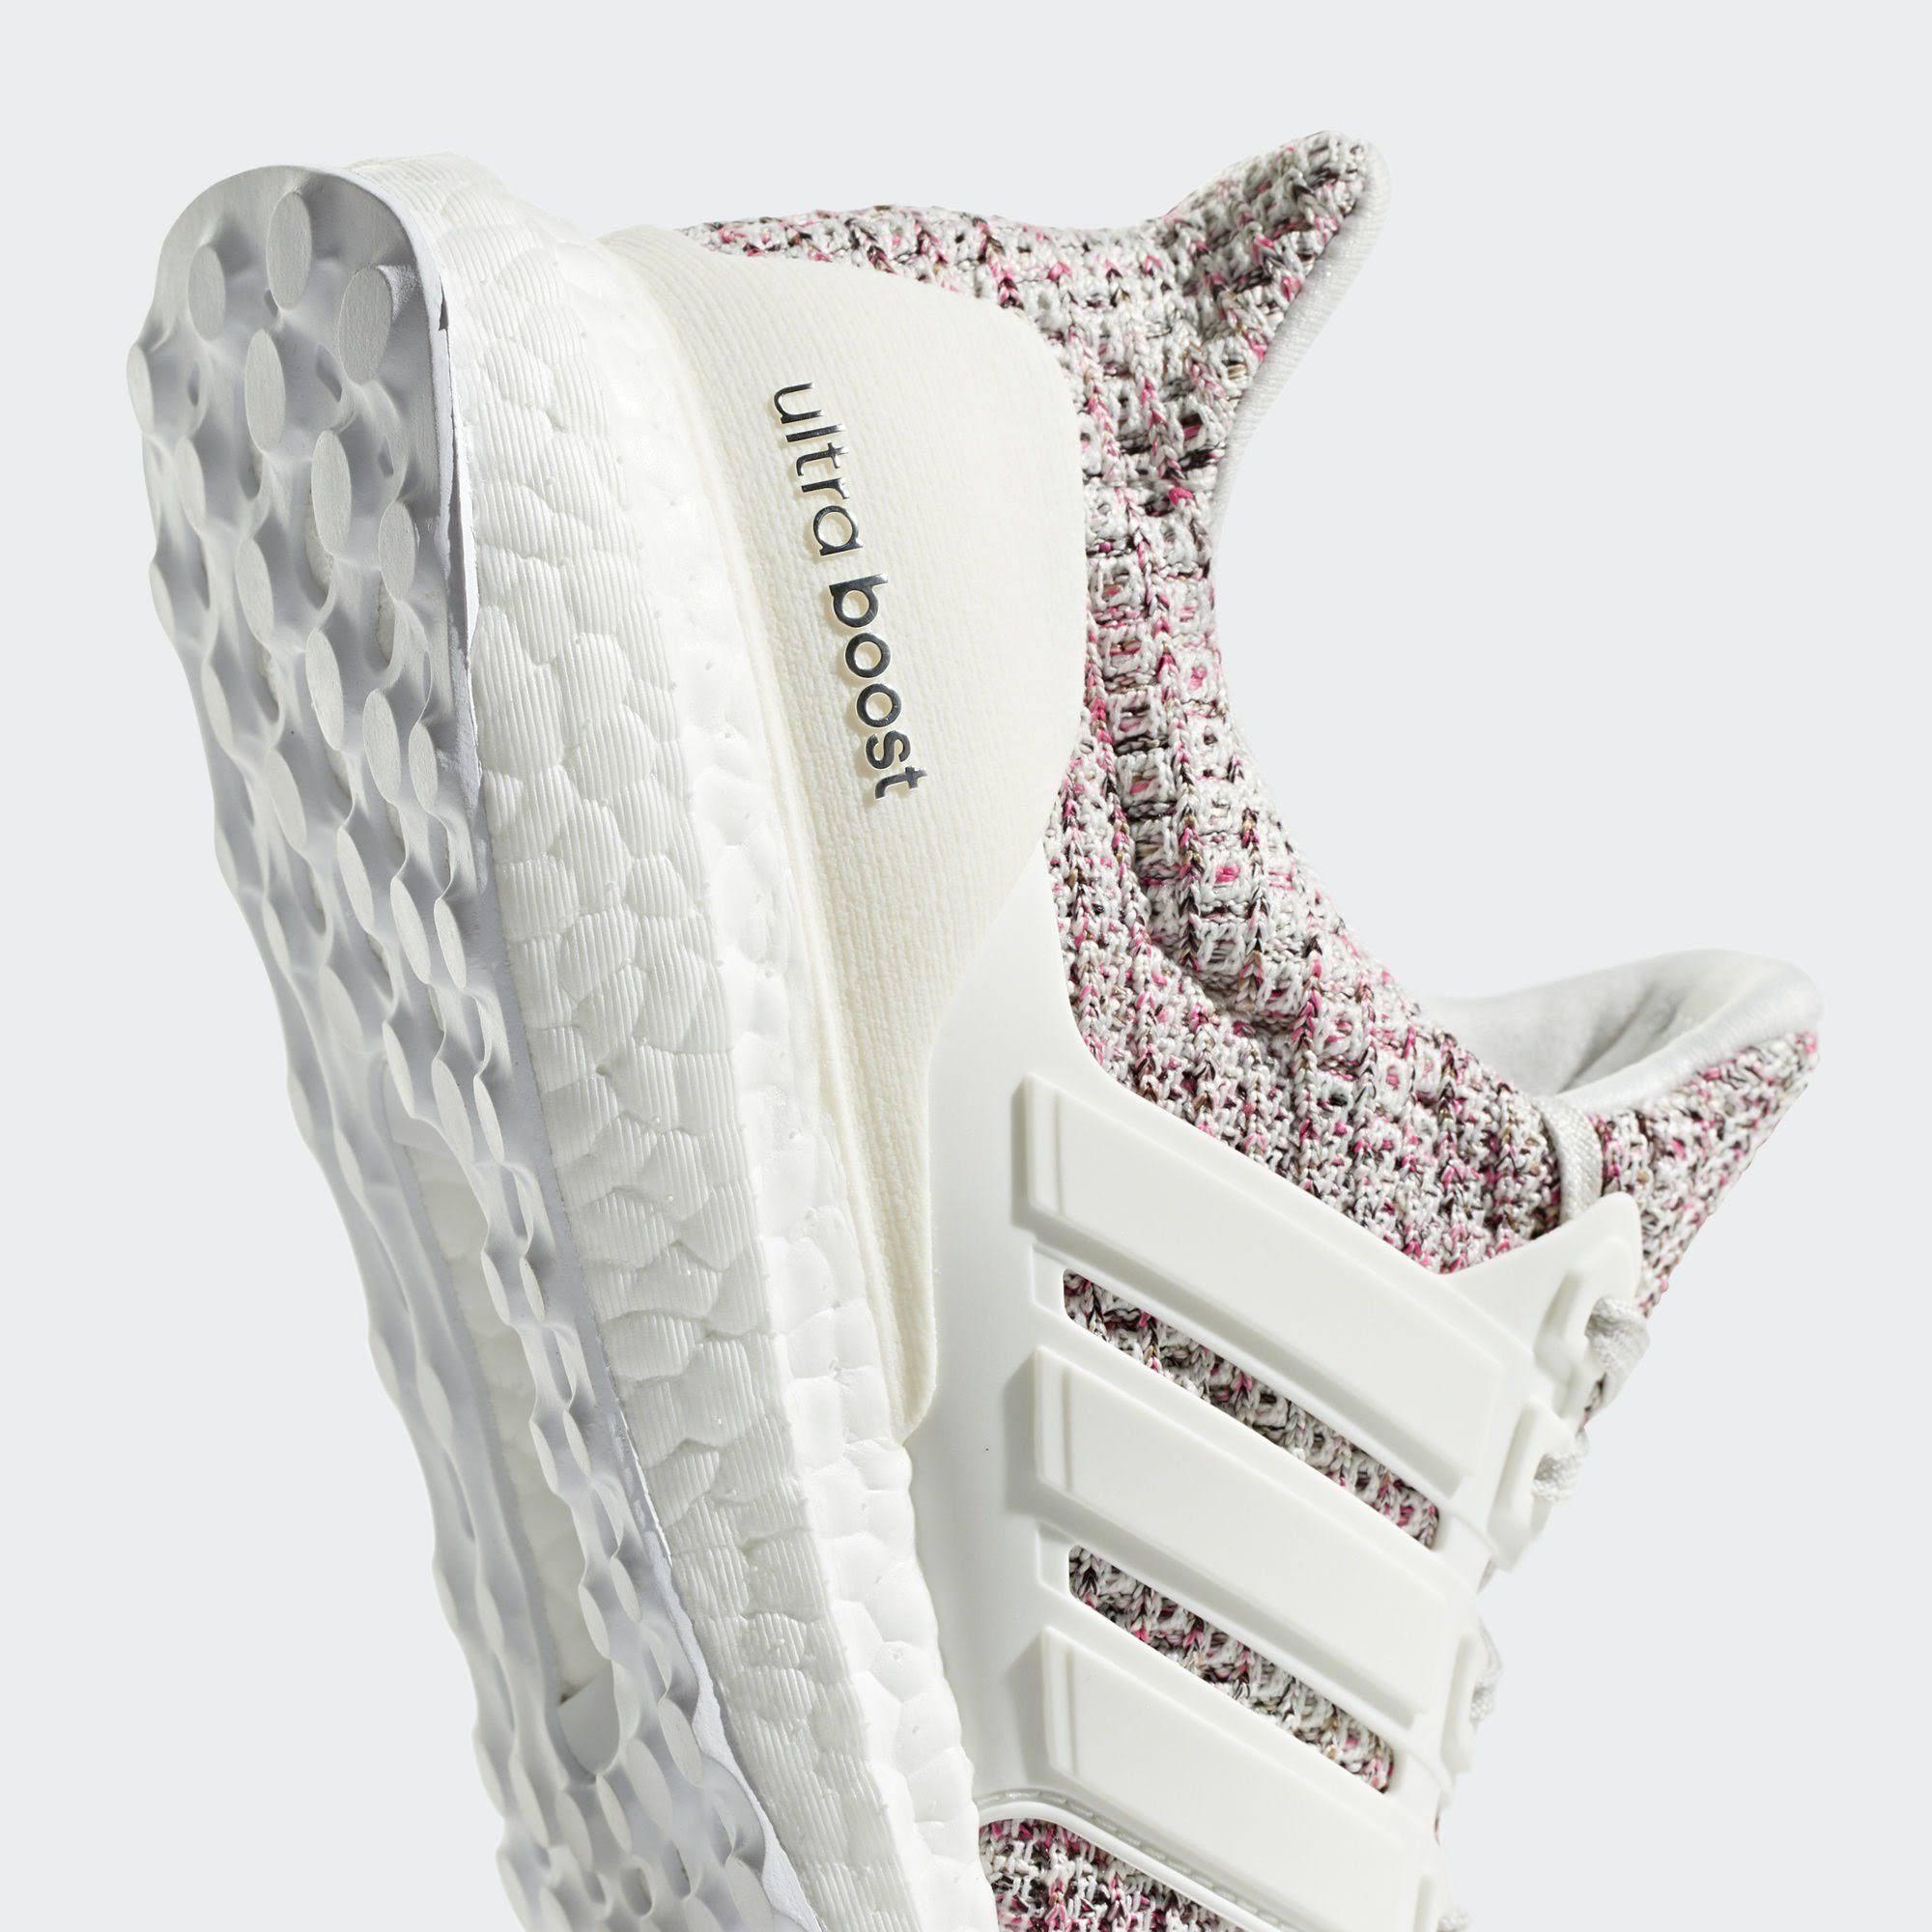 Laufschuh 37 Ultraboost Rosa Weiß Weiß 3 White Schuh Performance 1 Adidas 1Bwpqw